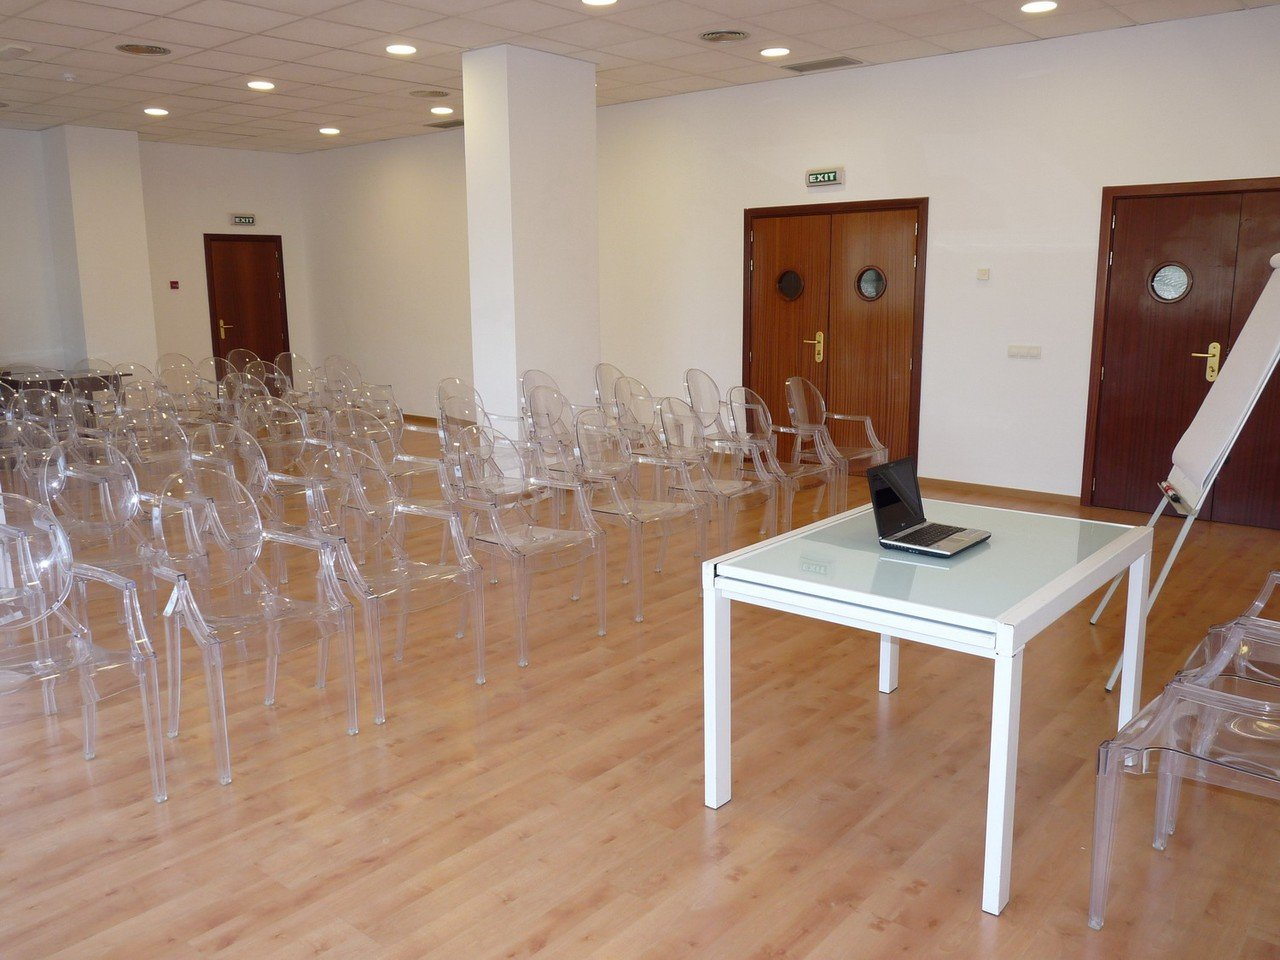 Malaga training rooms Salle de réunion Hotel Myramar - Salon Fuengirola image 0